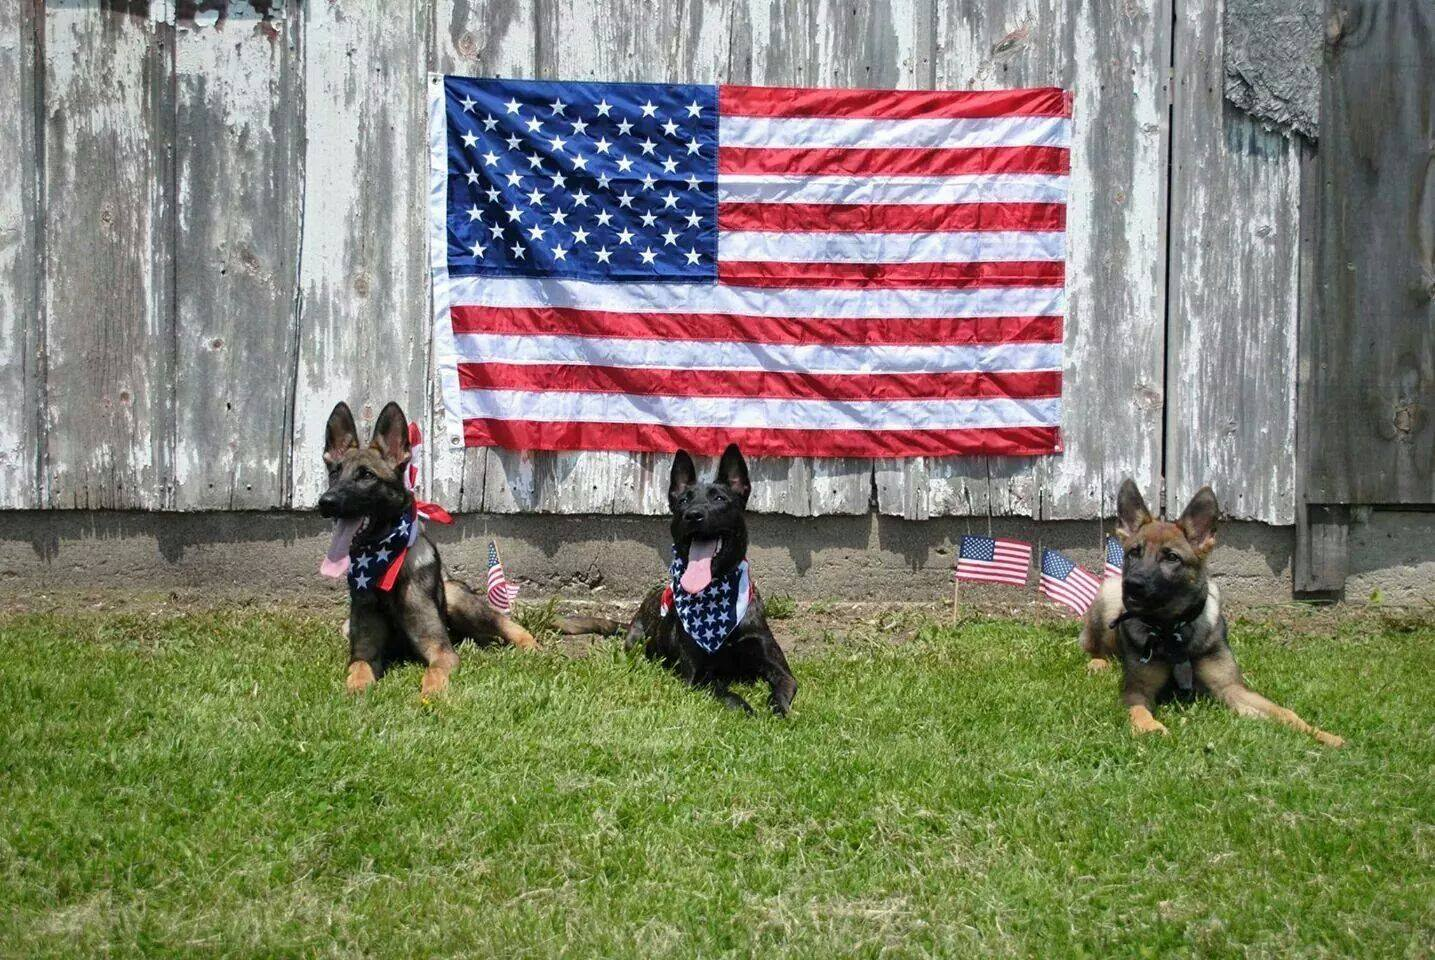 Patriot Dog Training San Antonio Austin New Braunfels Boerne Puppy Training Obedience Training Group Classes Doggy Day Care Dog Boarding